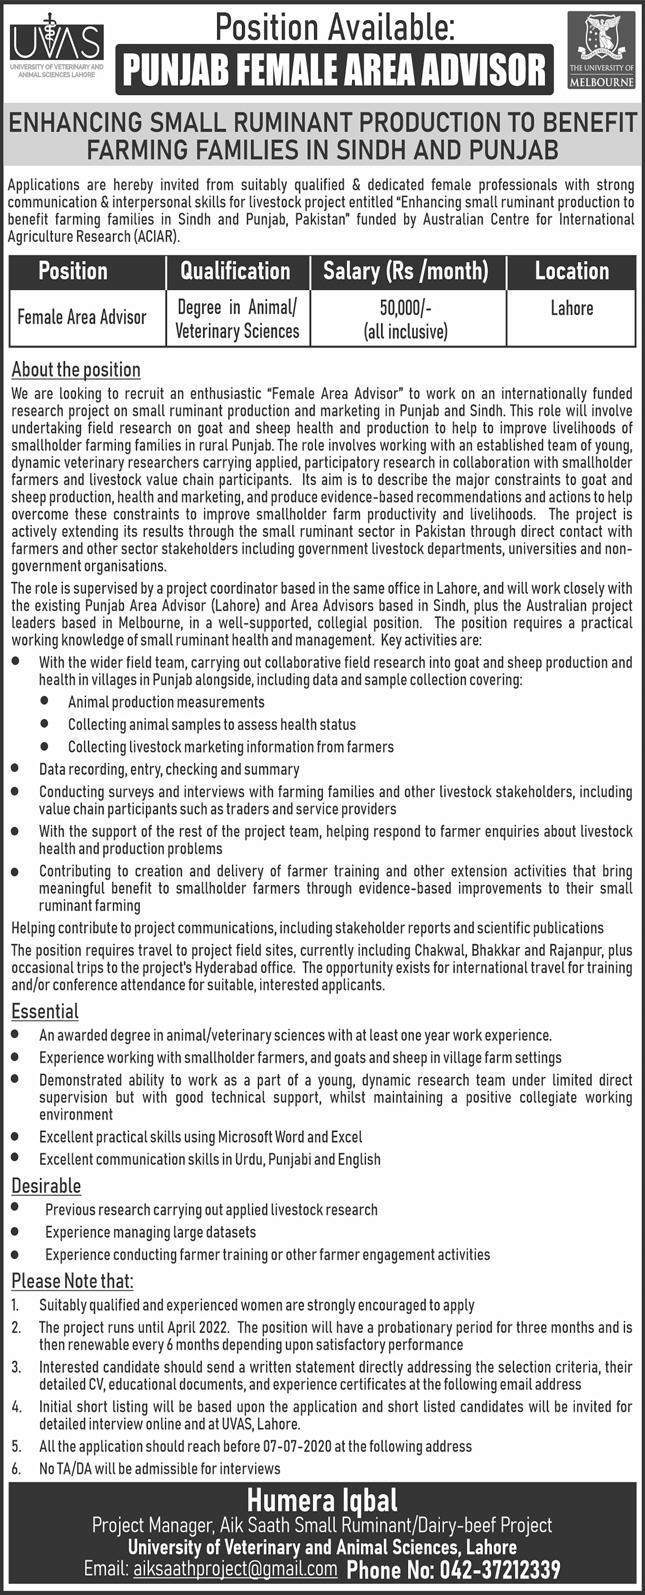 University of Veterinary and Animal Sciences Lahore Jobs as Female Area Advisor